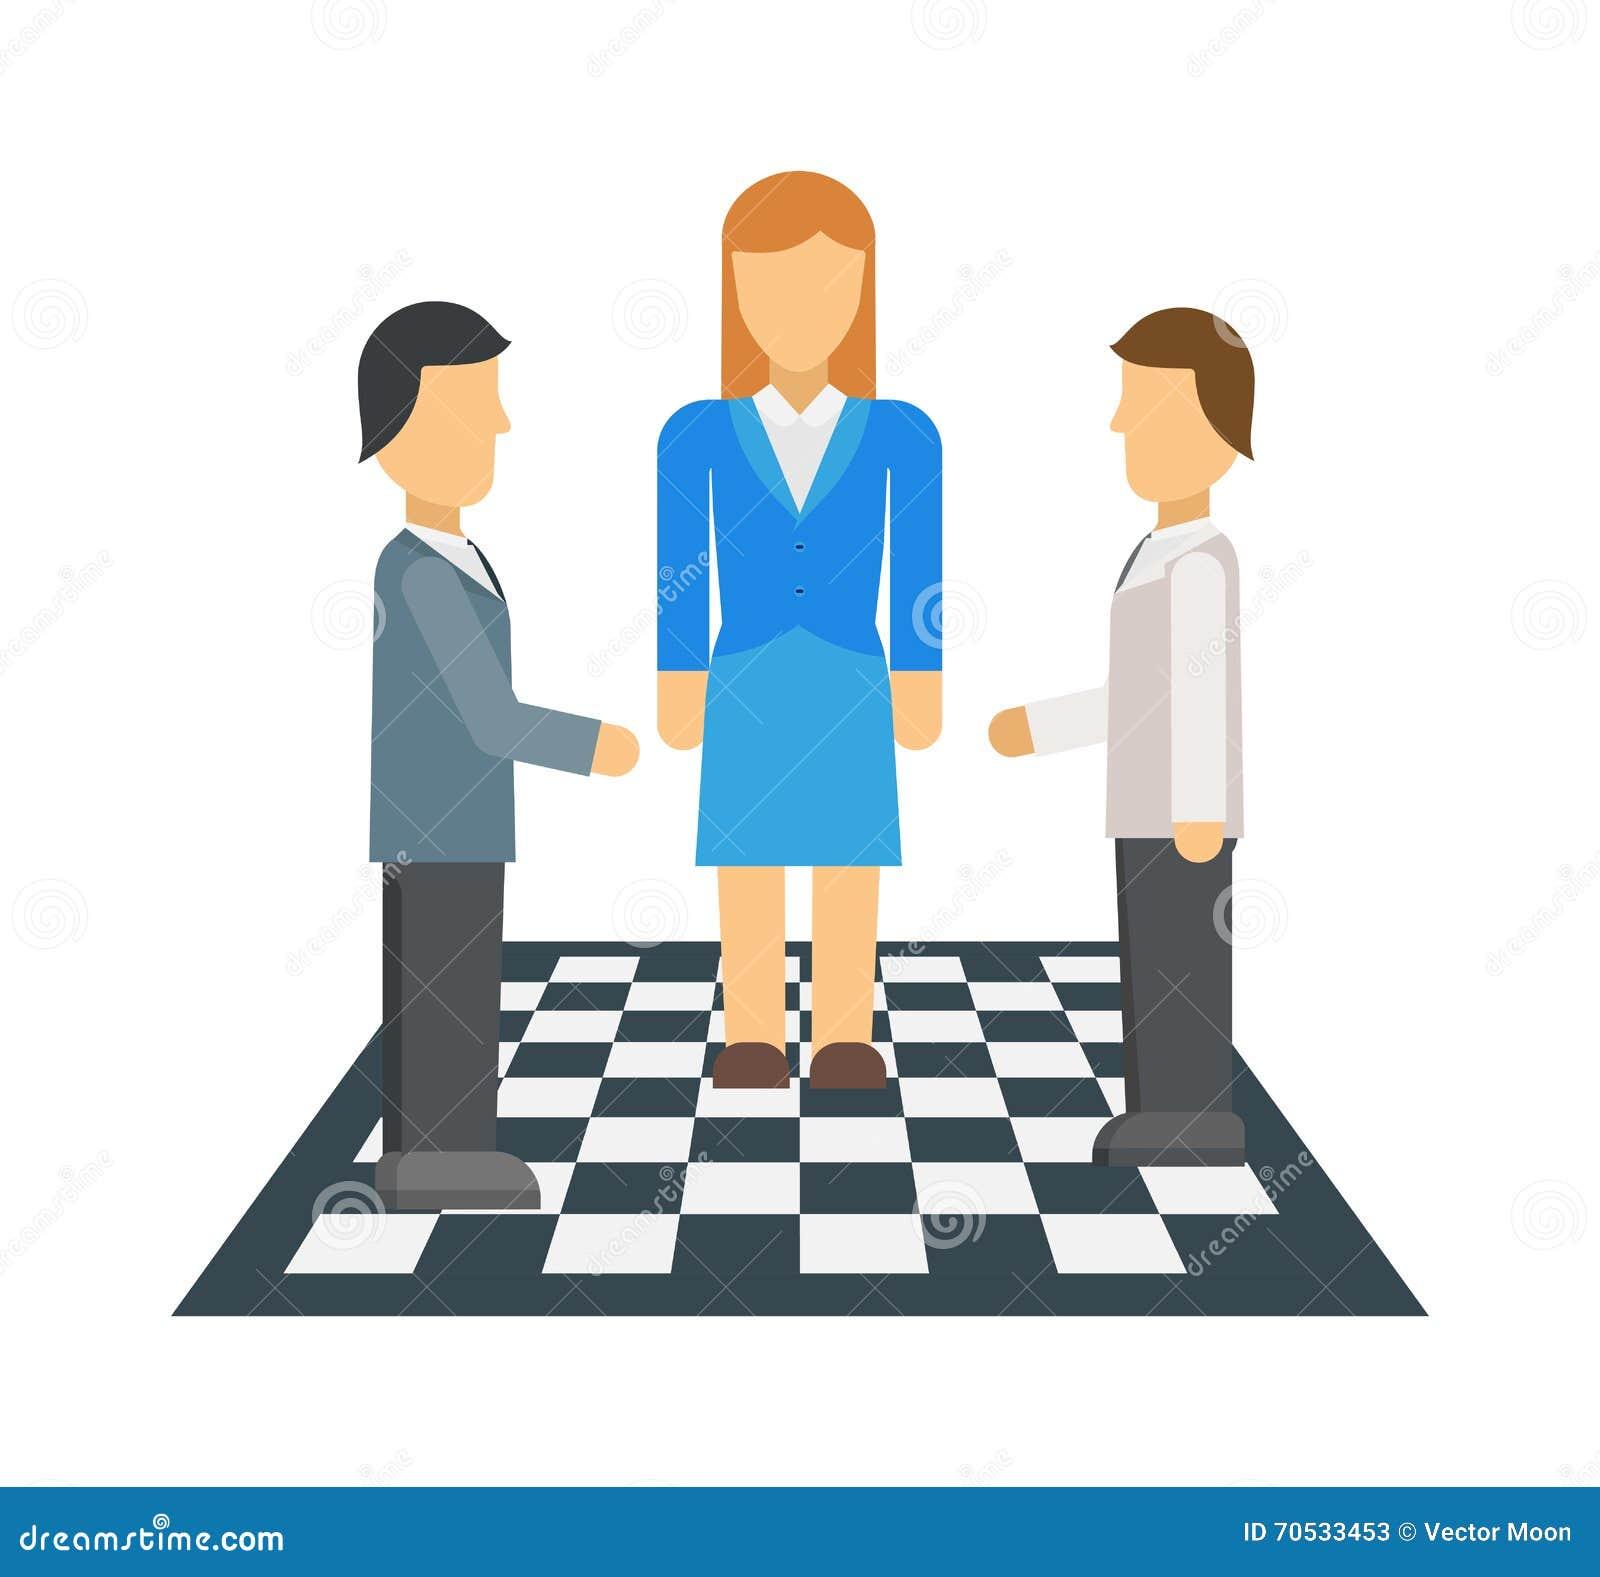 Essential facilitation skills for managing virtual teams